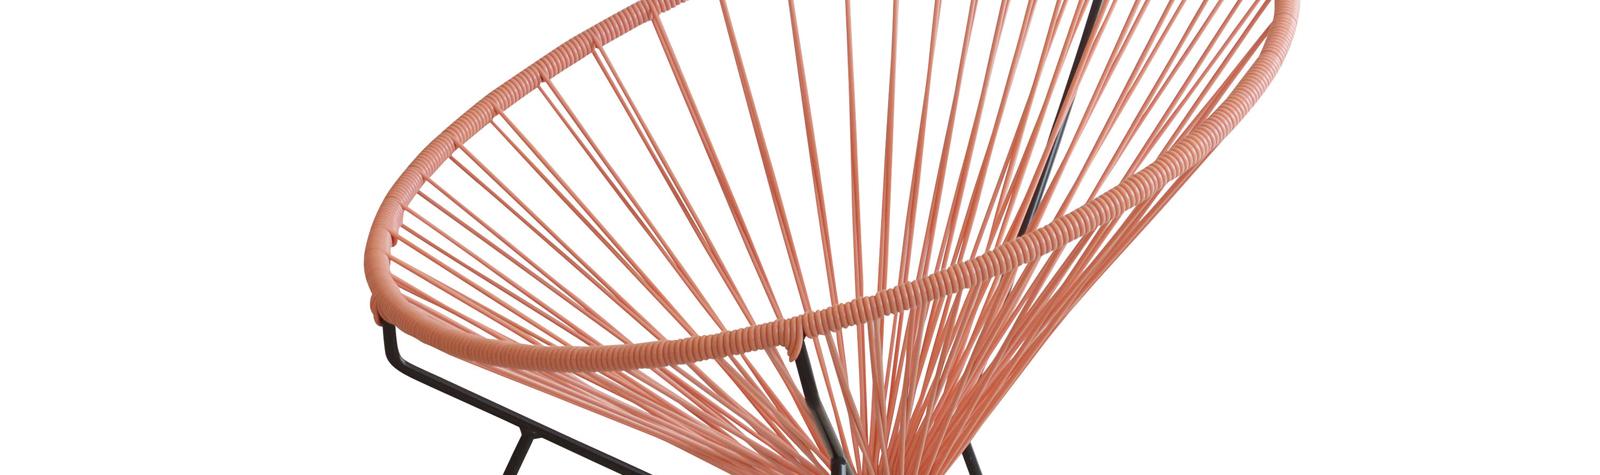 Le fauteuil CONDESA